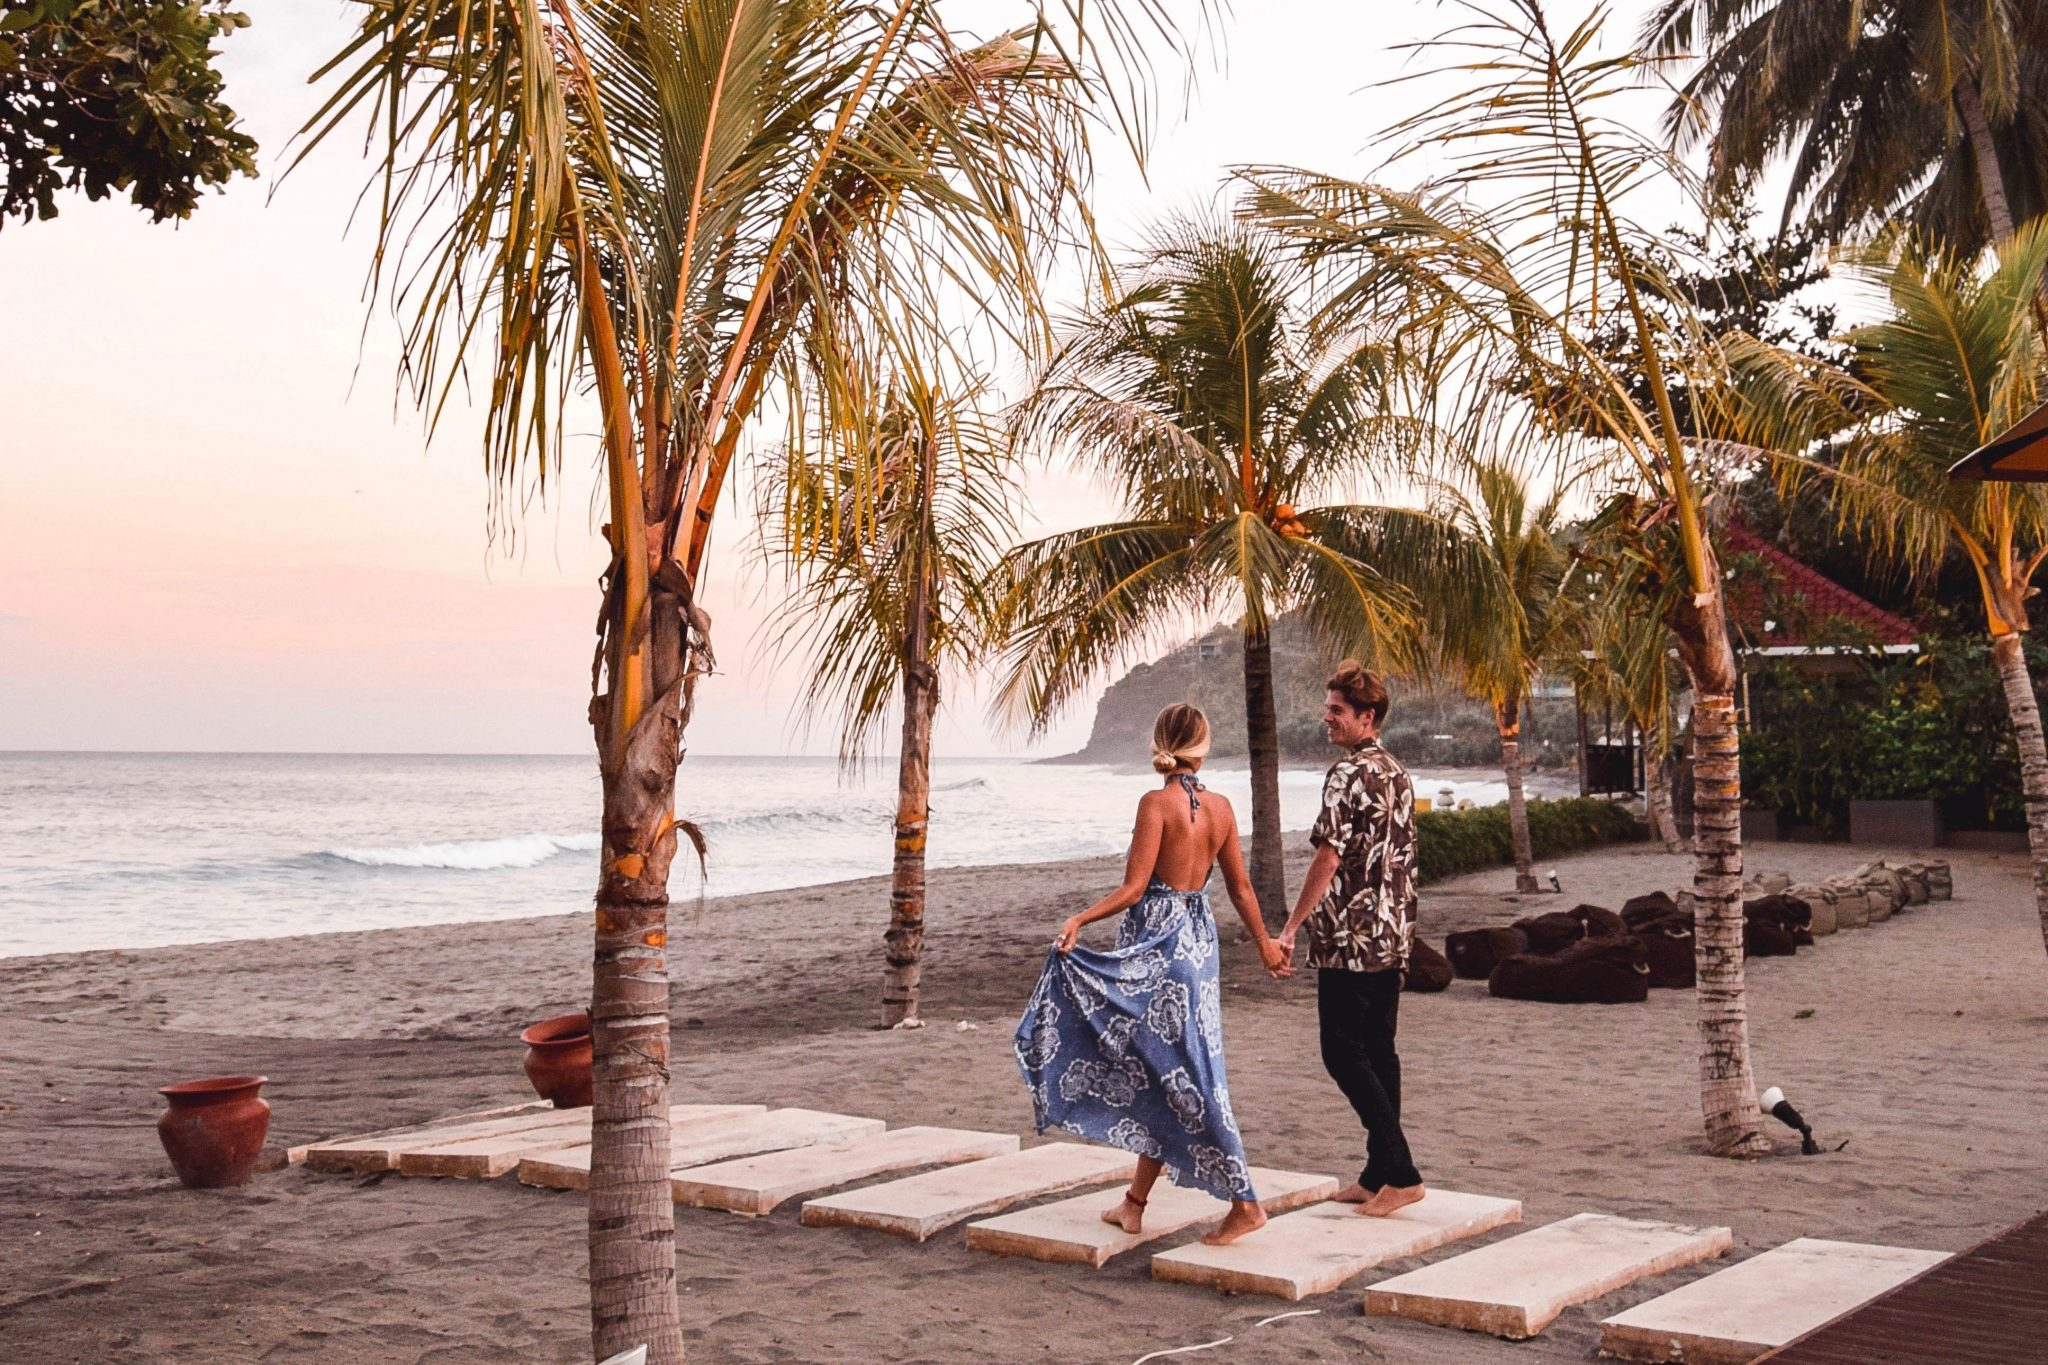 Wanderers & Warriors - Charlie & Lauren UK Travel Couple - Things To Do In Lombok + Lombok Itinerary Senggigi